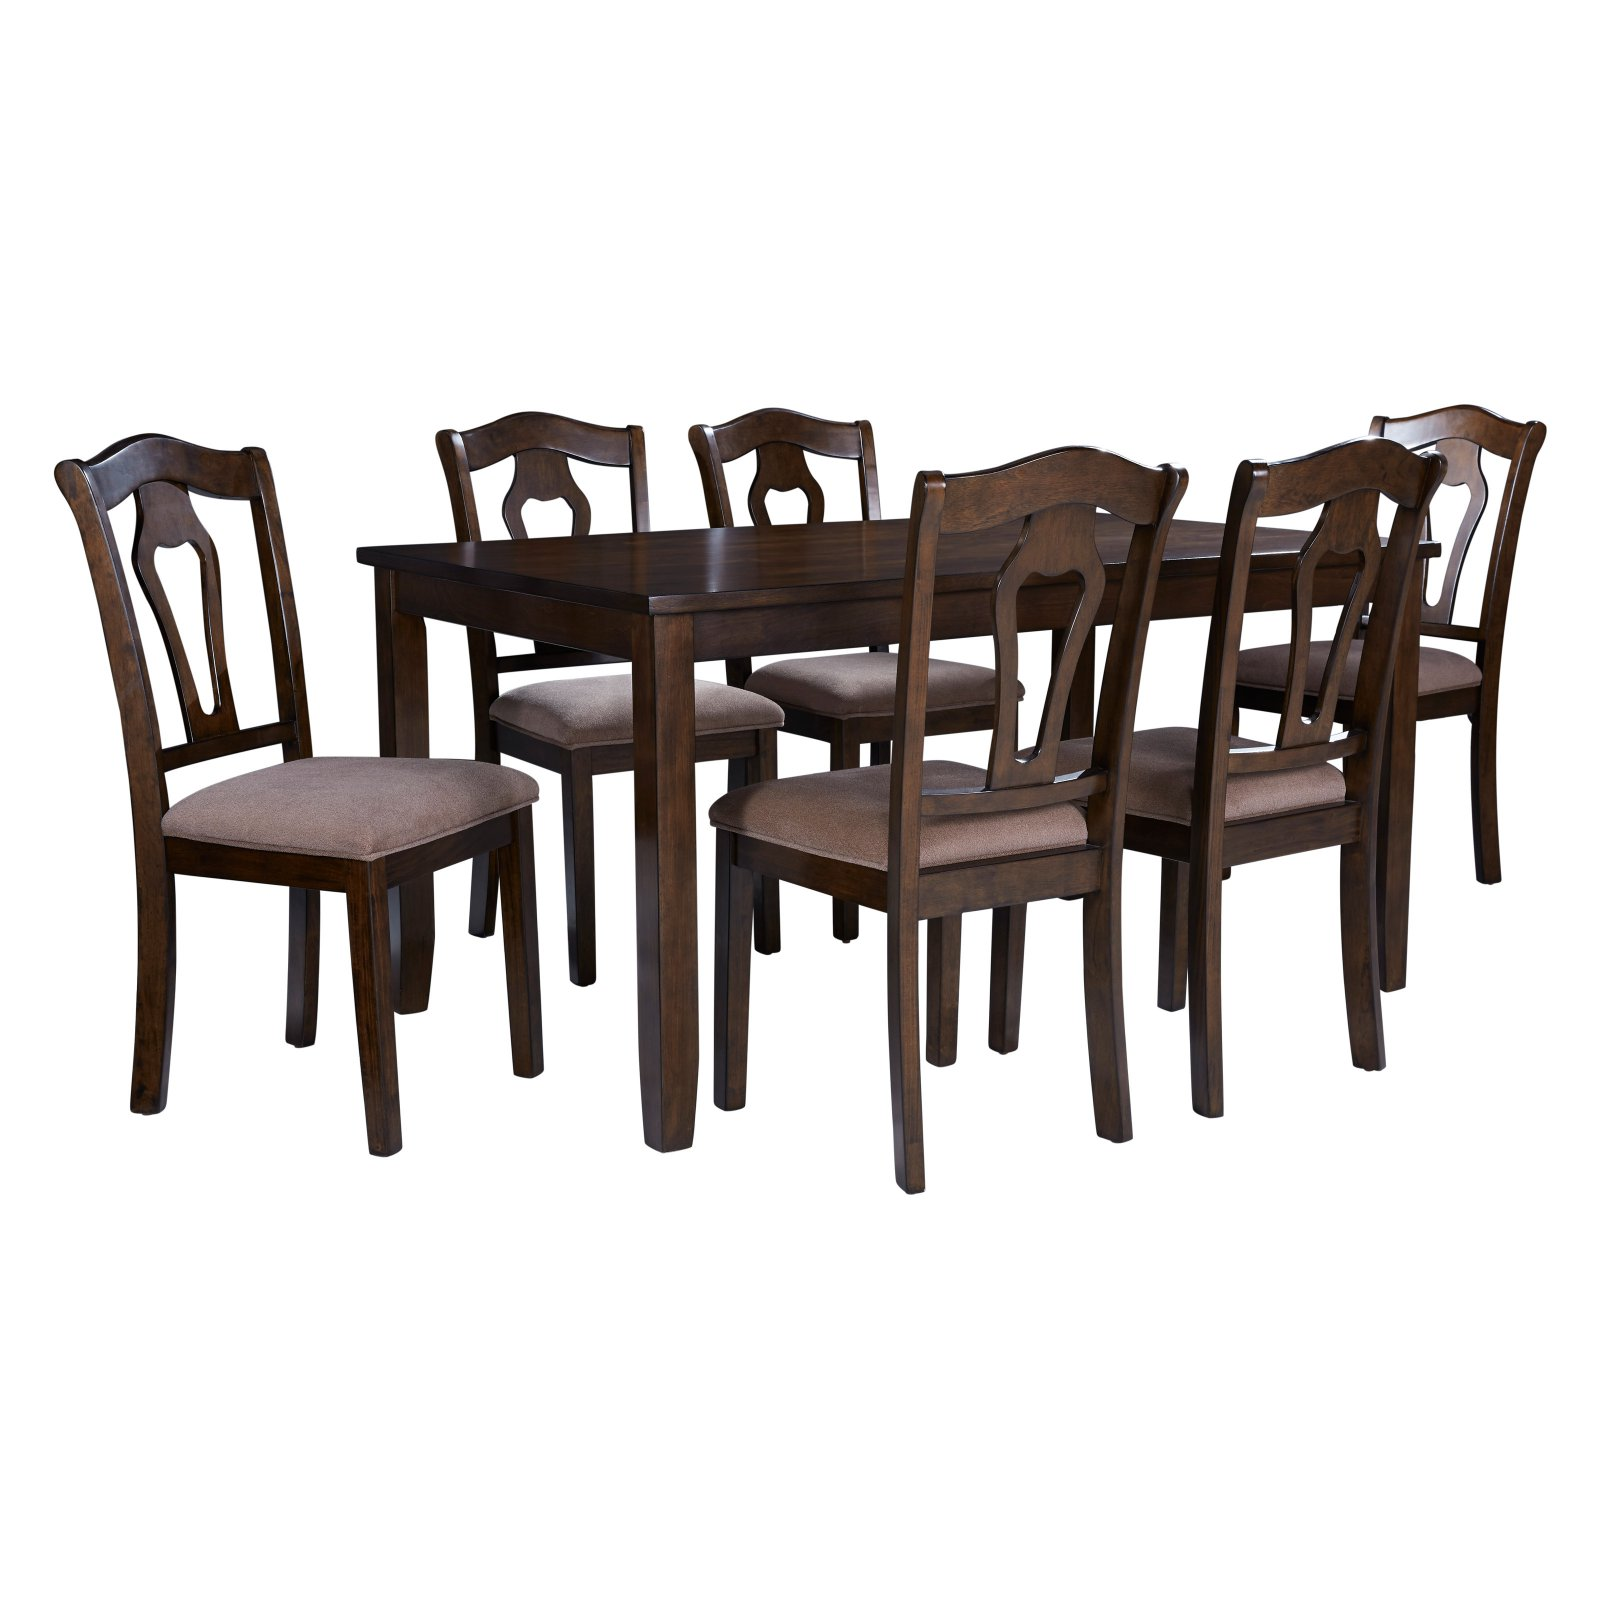 Standard Furniture Grandville 7-Piece Traditional Dining Table Set